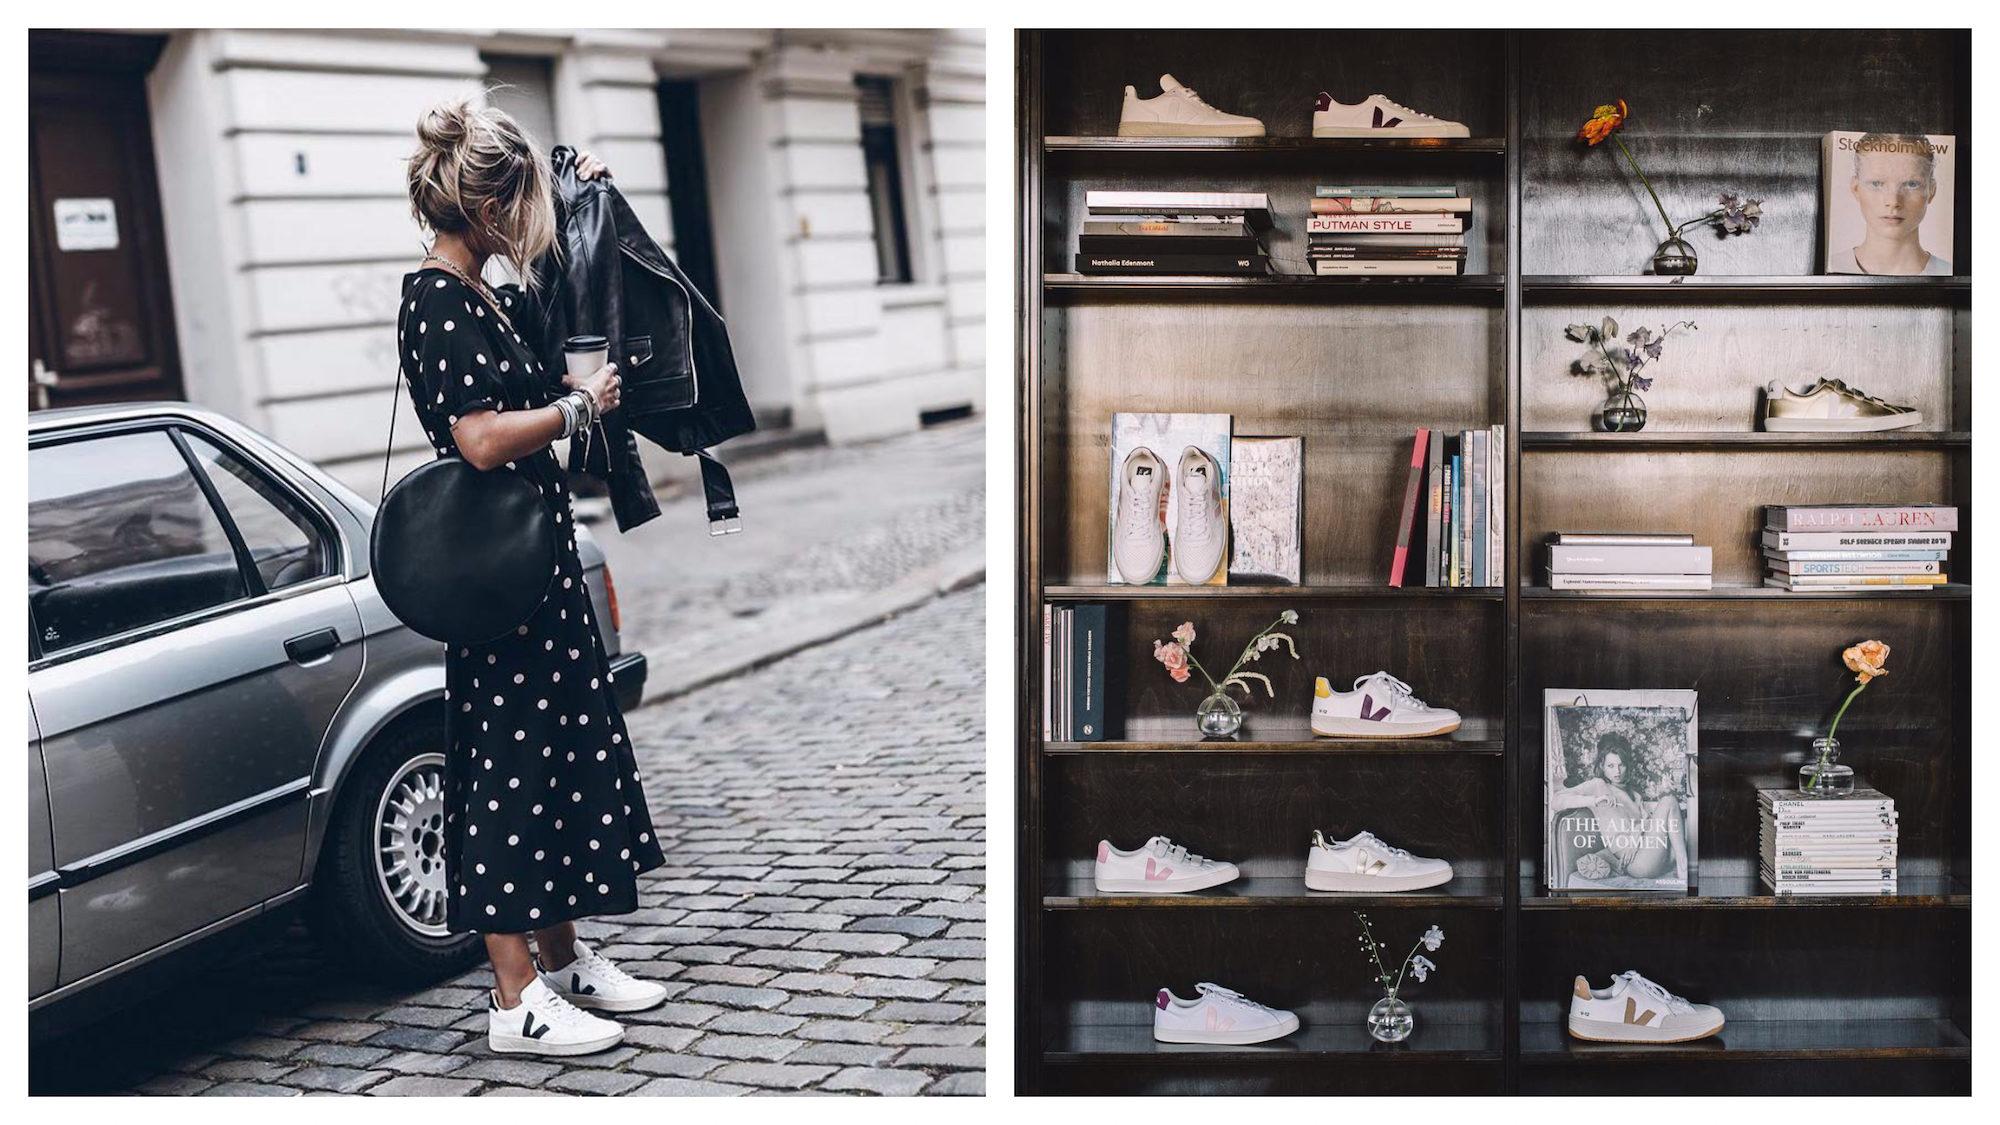 Hotel Villa La Parisienne Parigi 5 french fashion brands for looking like a parisienne | hip